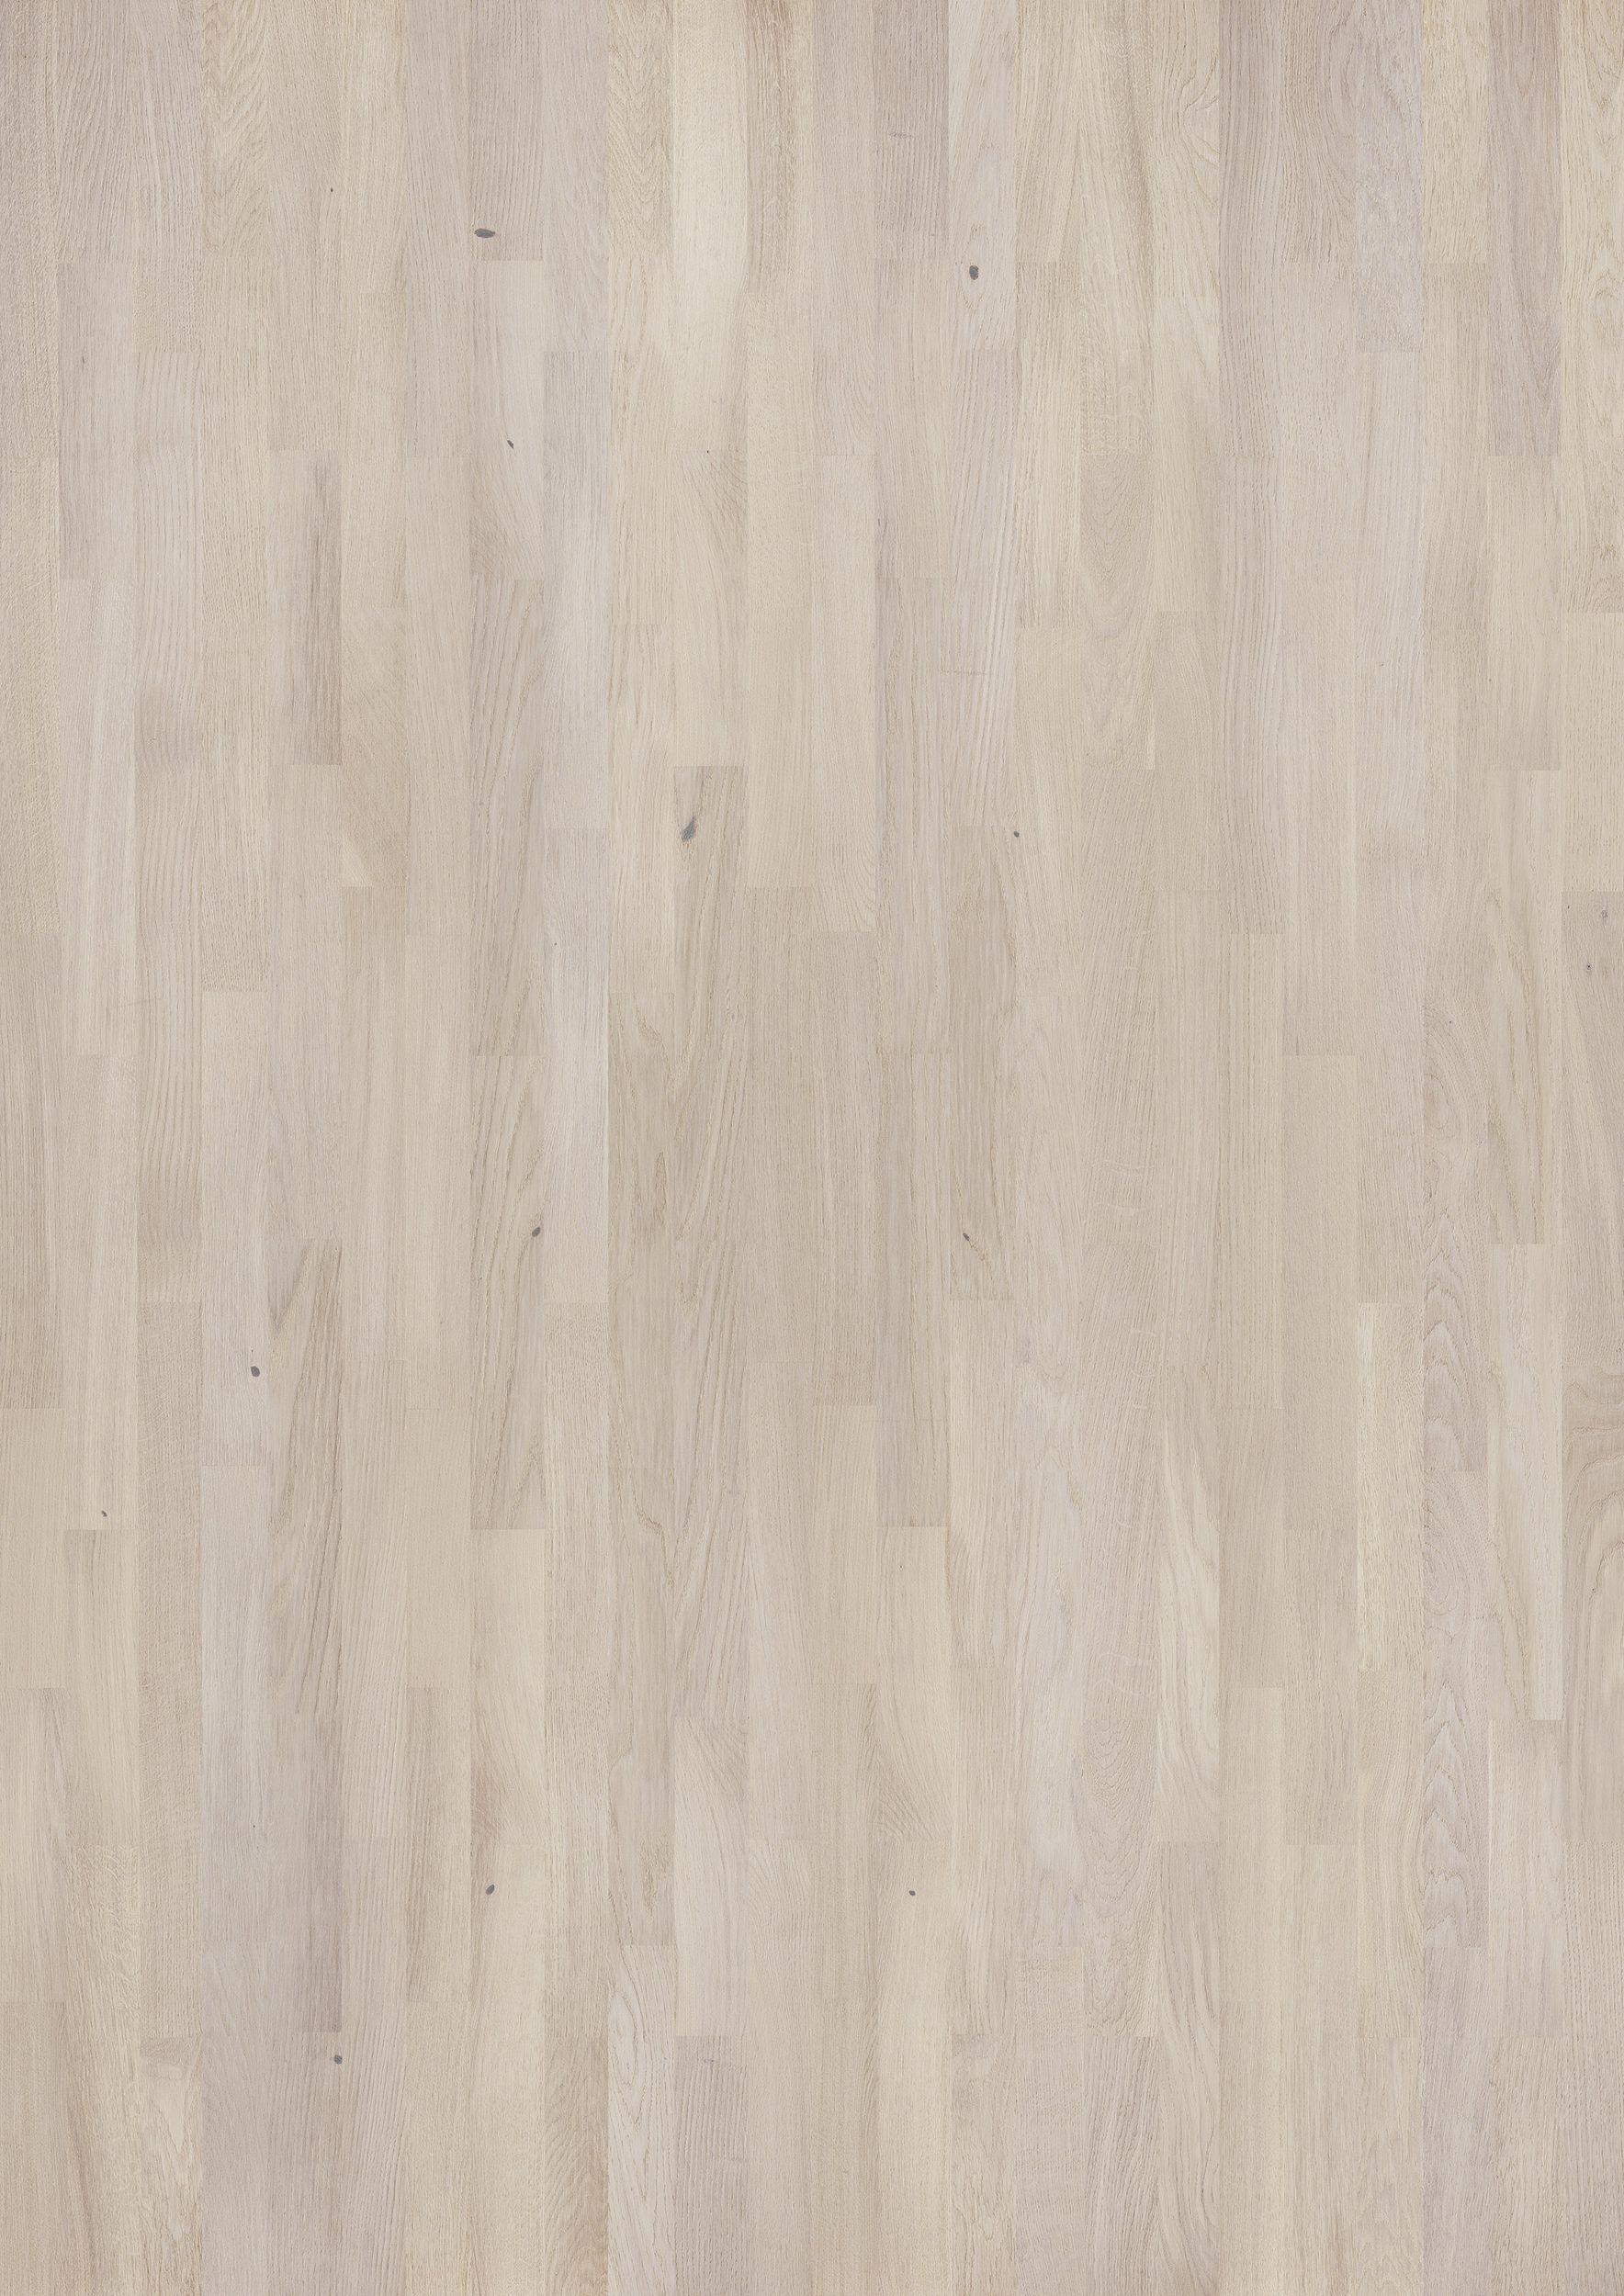 Dab Cappuccino Barlinek Barlinek Flooring Hardwood Floors